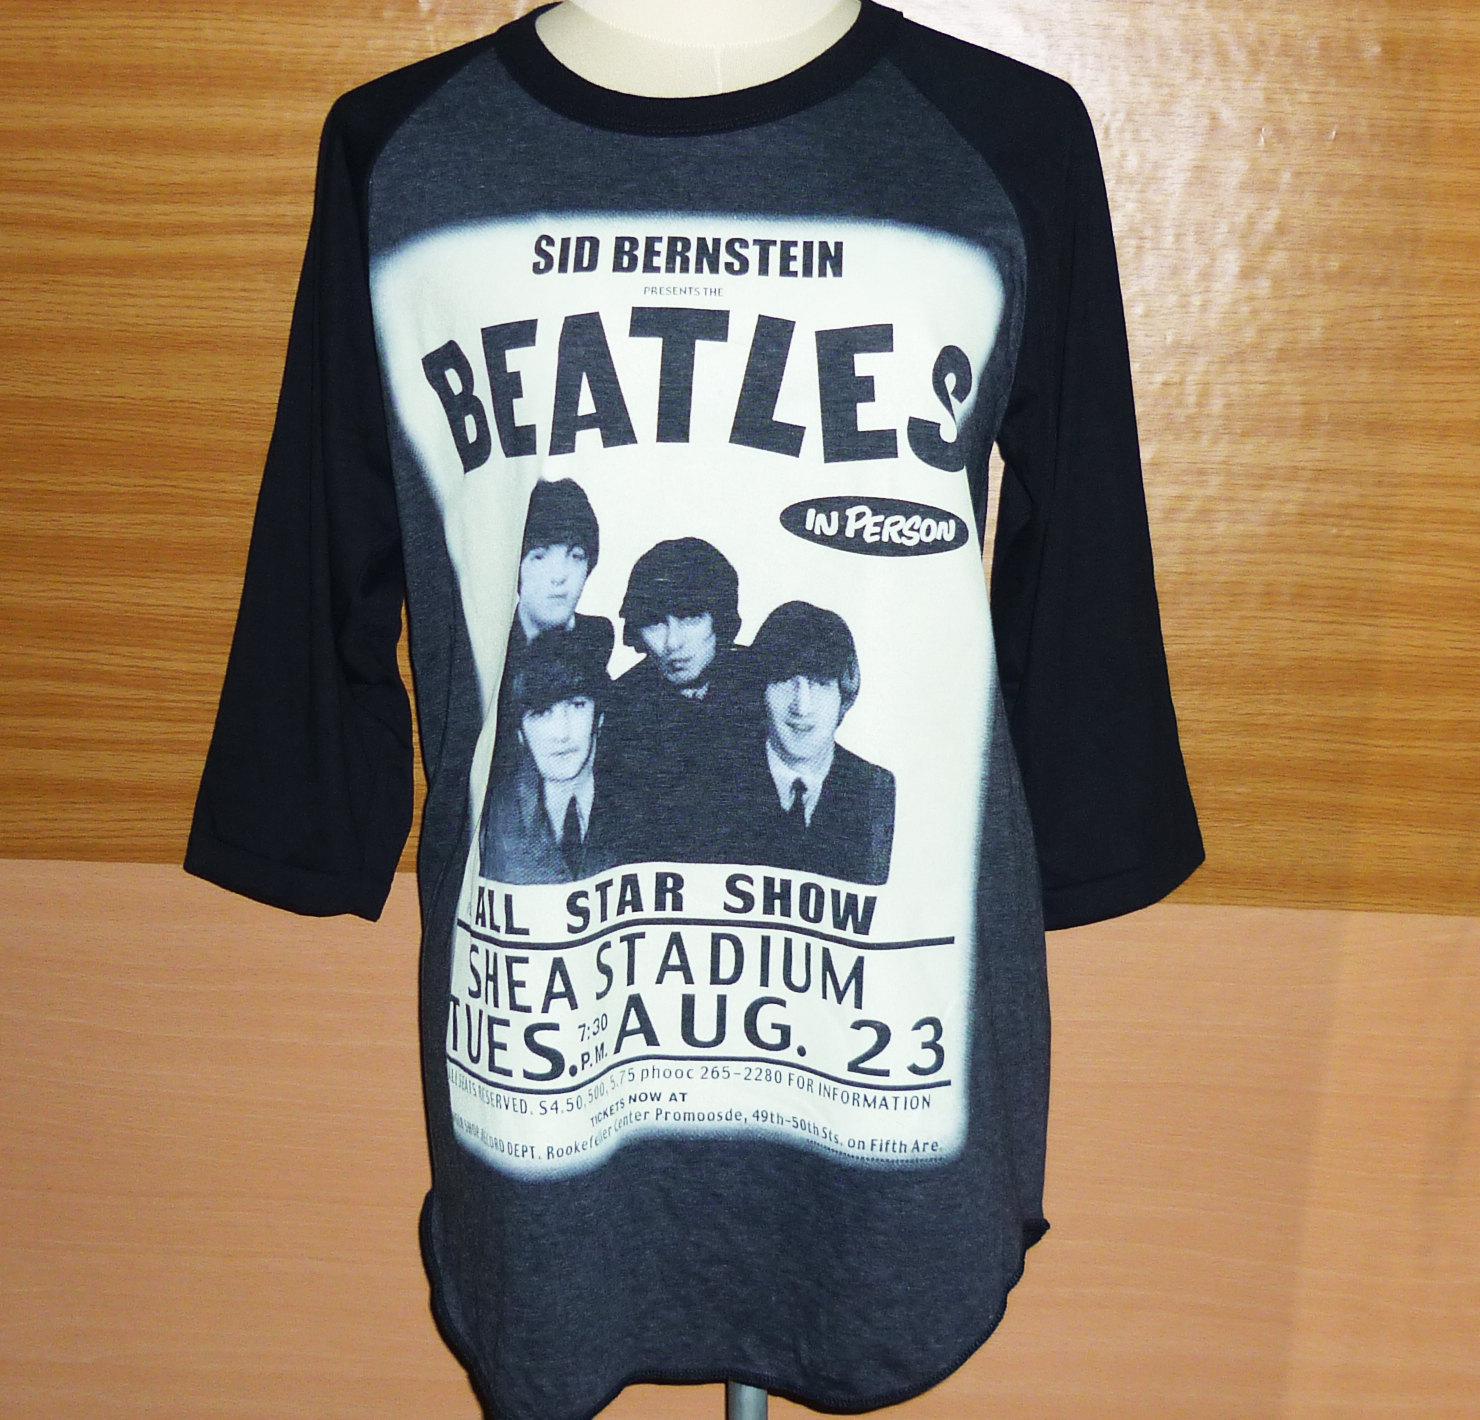 The beatles face pop rock t shirt raglan tee unisex billboard music men women long sleeve baseball shirt tshirt gray black size m l